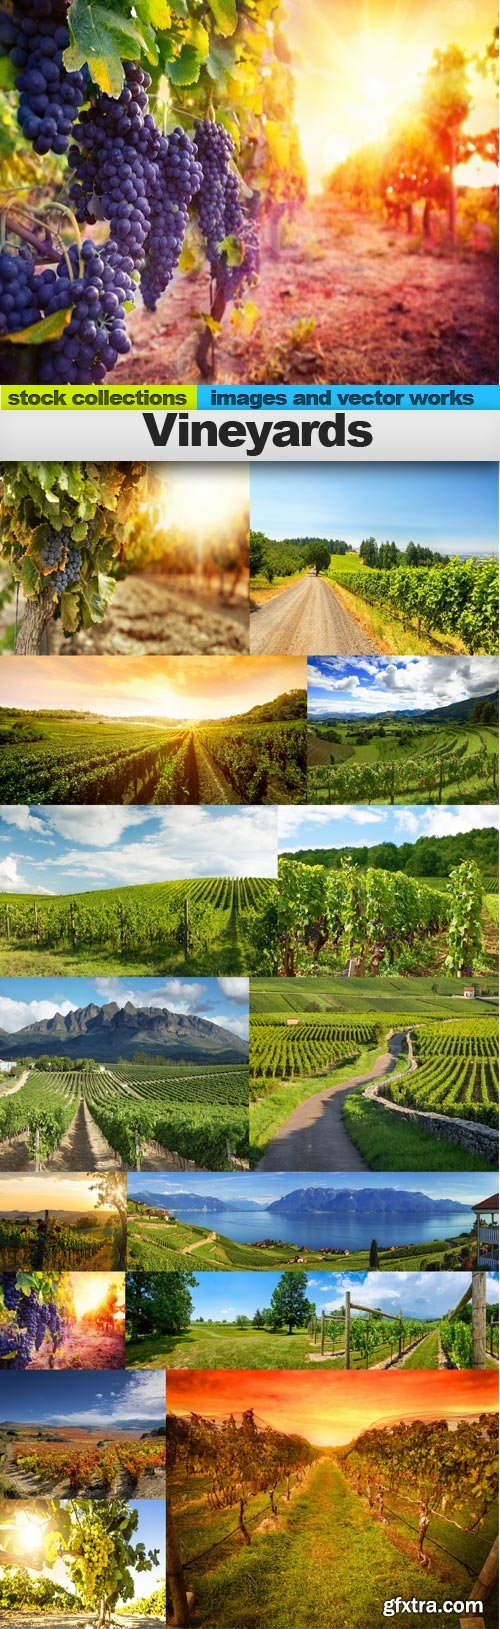 Vineyards, 15 x UHQ JPEG